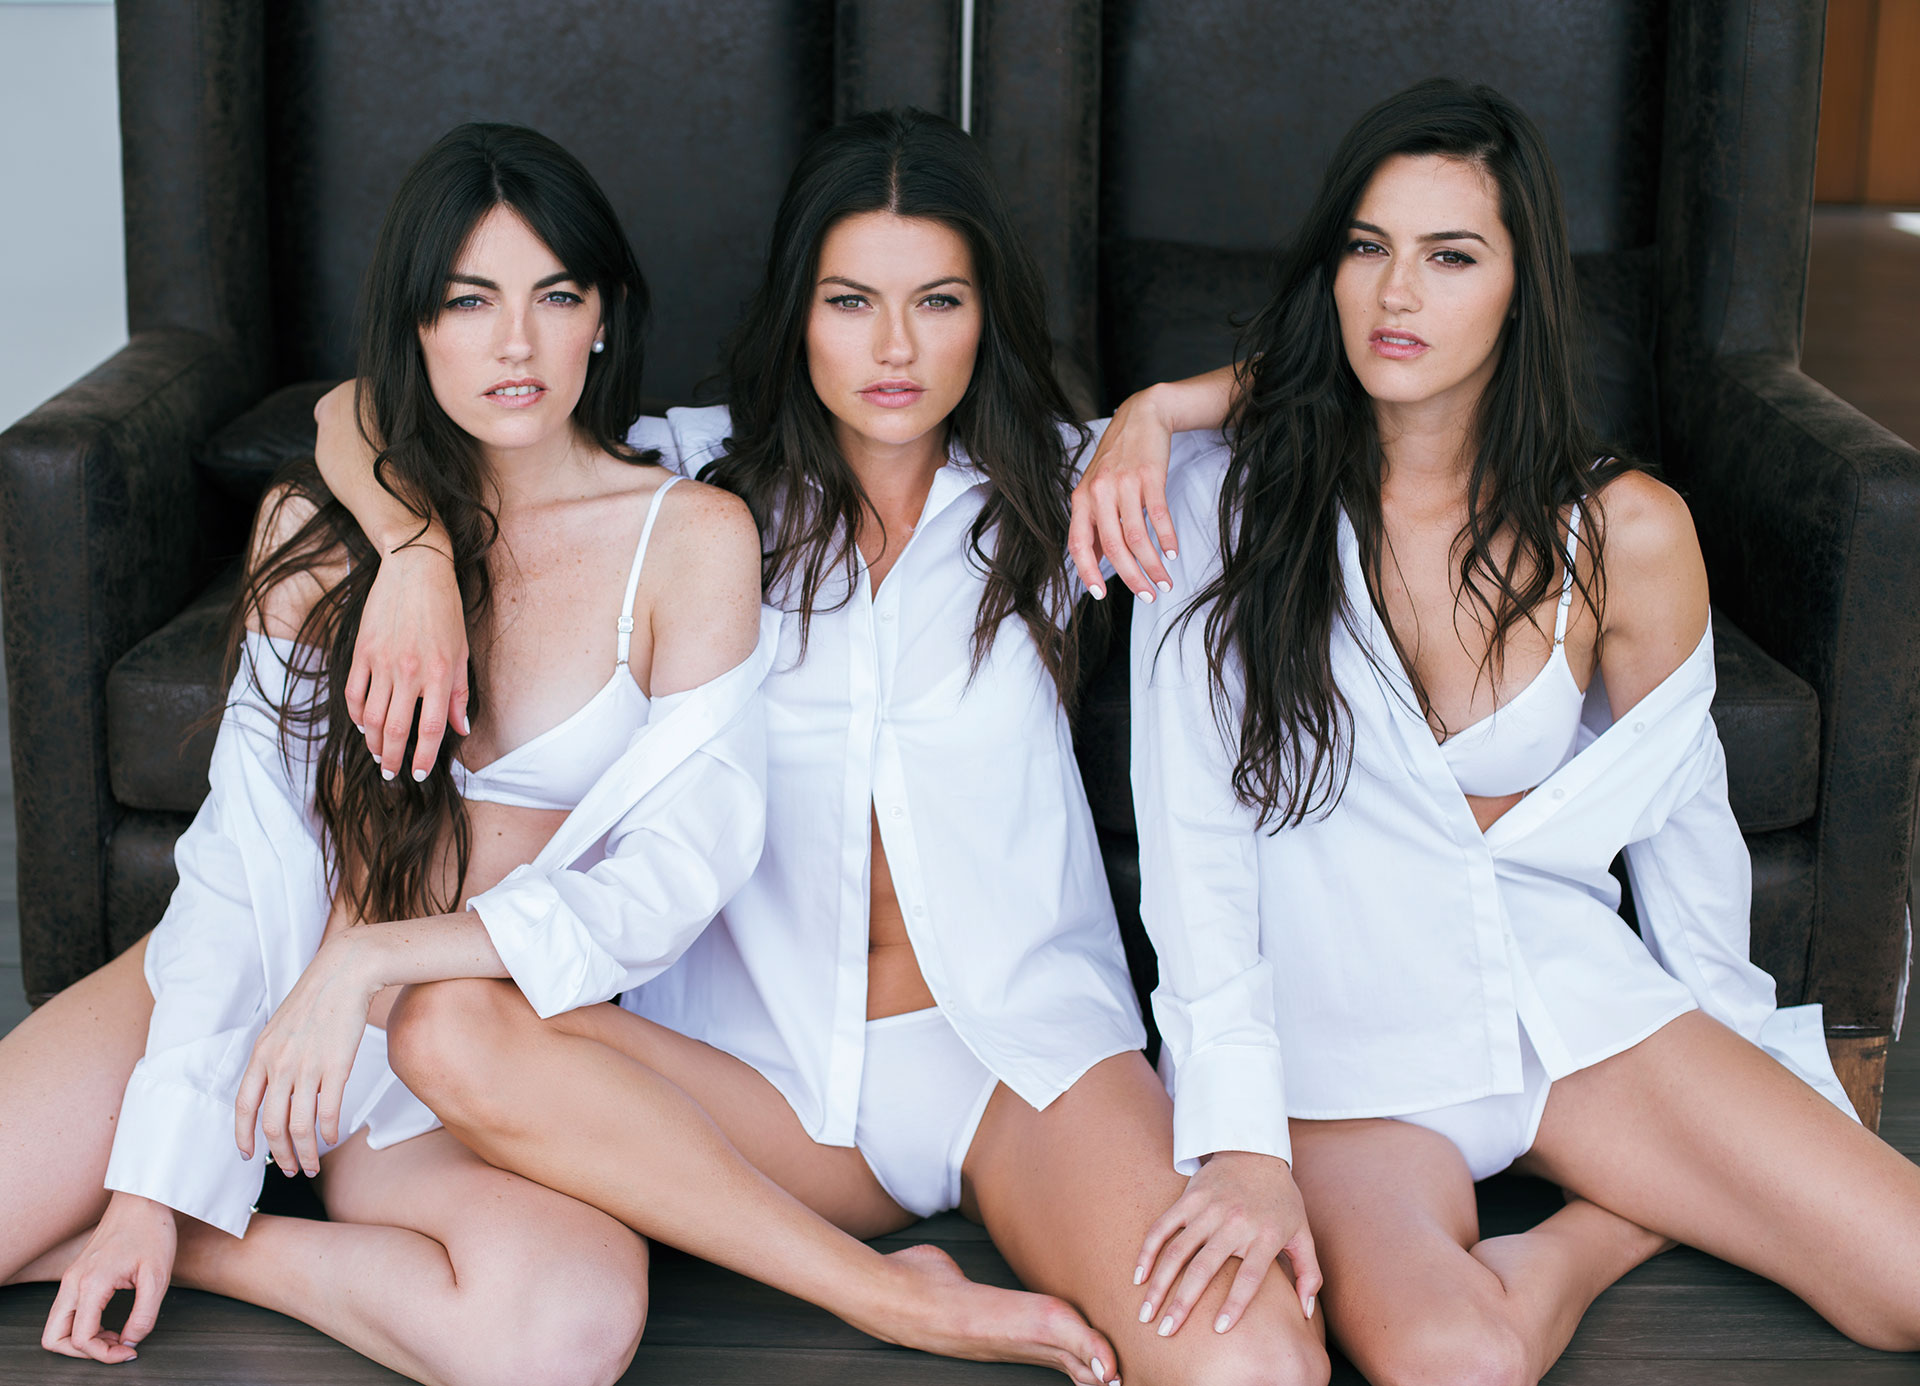 Las hemanas Giménez: Inés, Sofía y Pilar. Foto: Anita Thomas